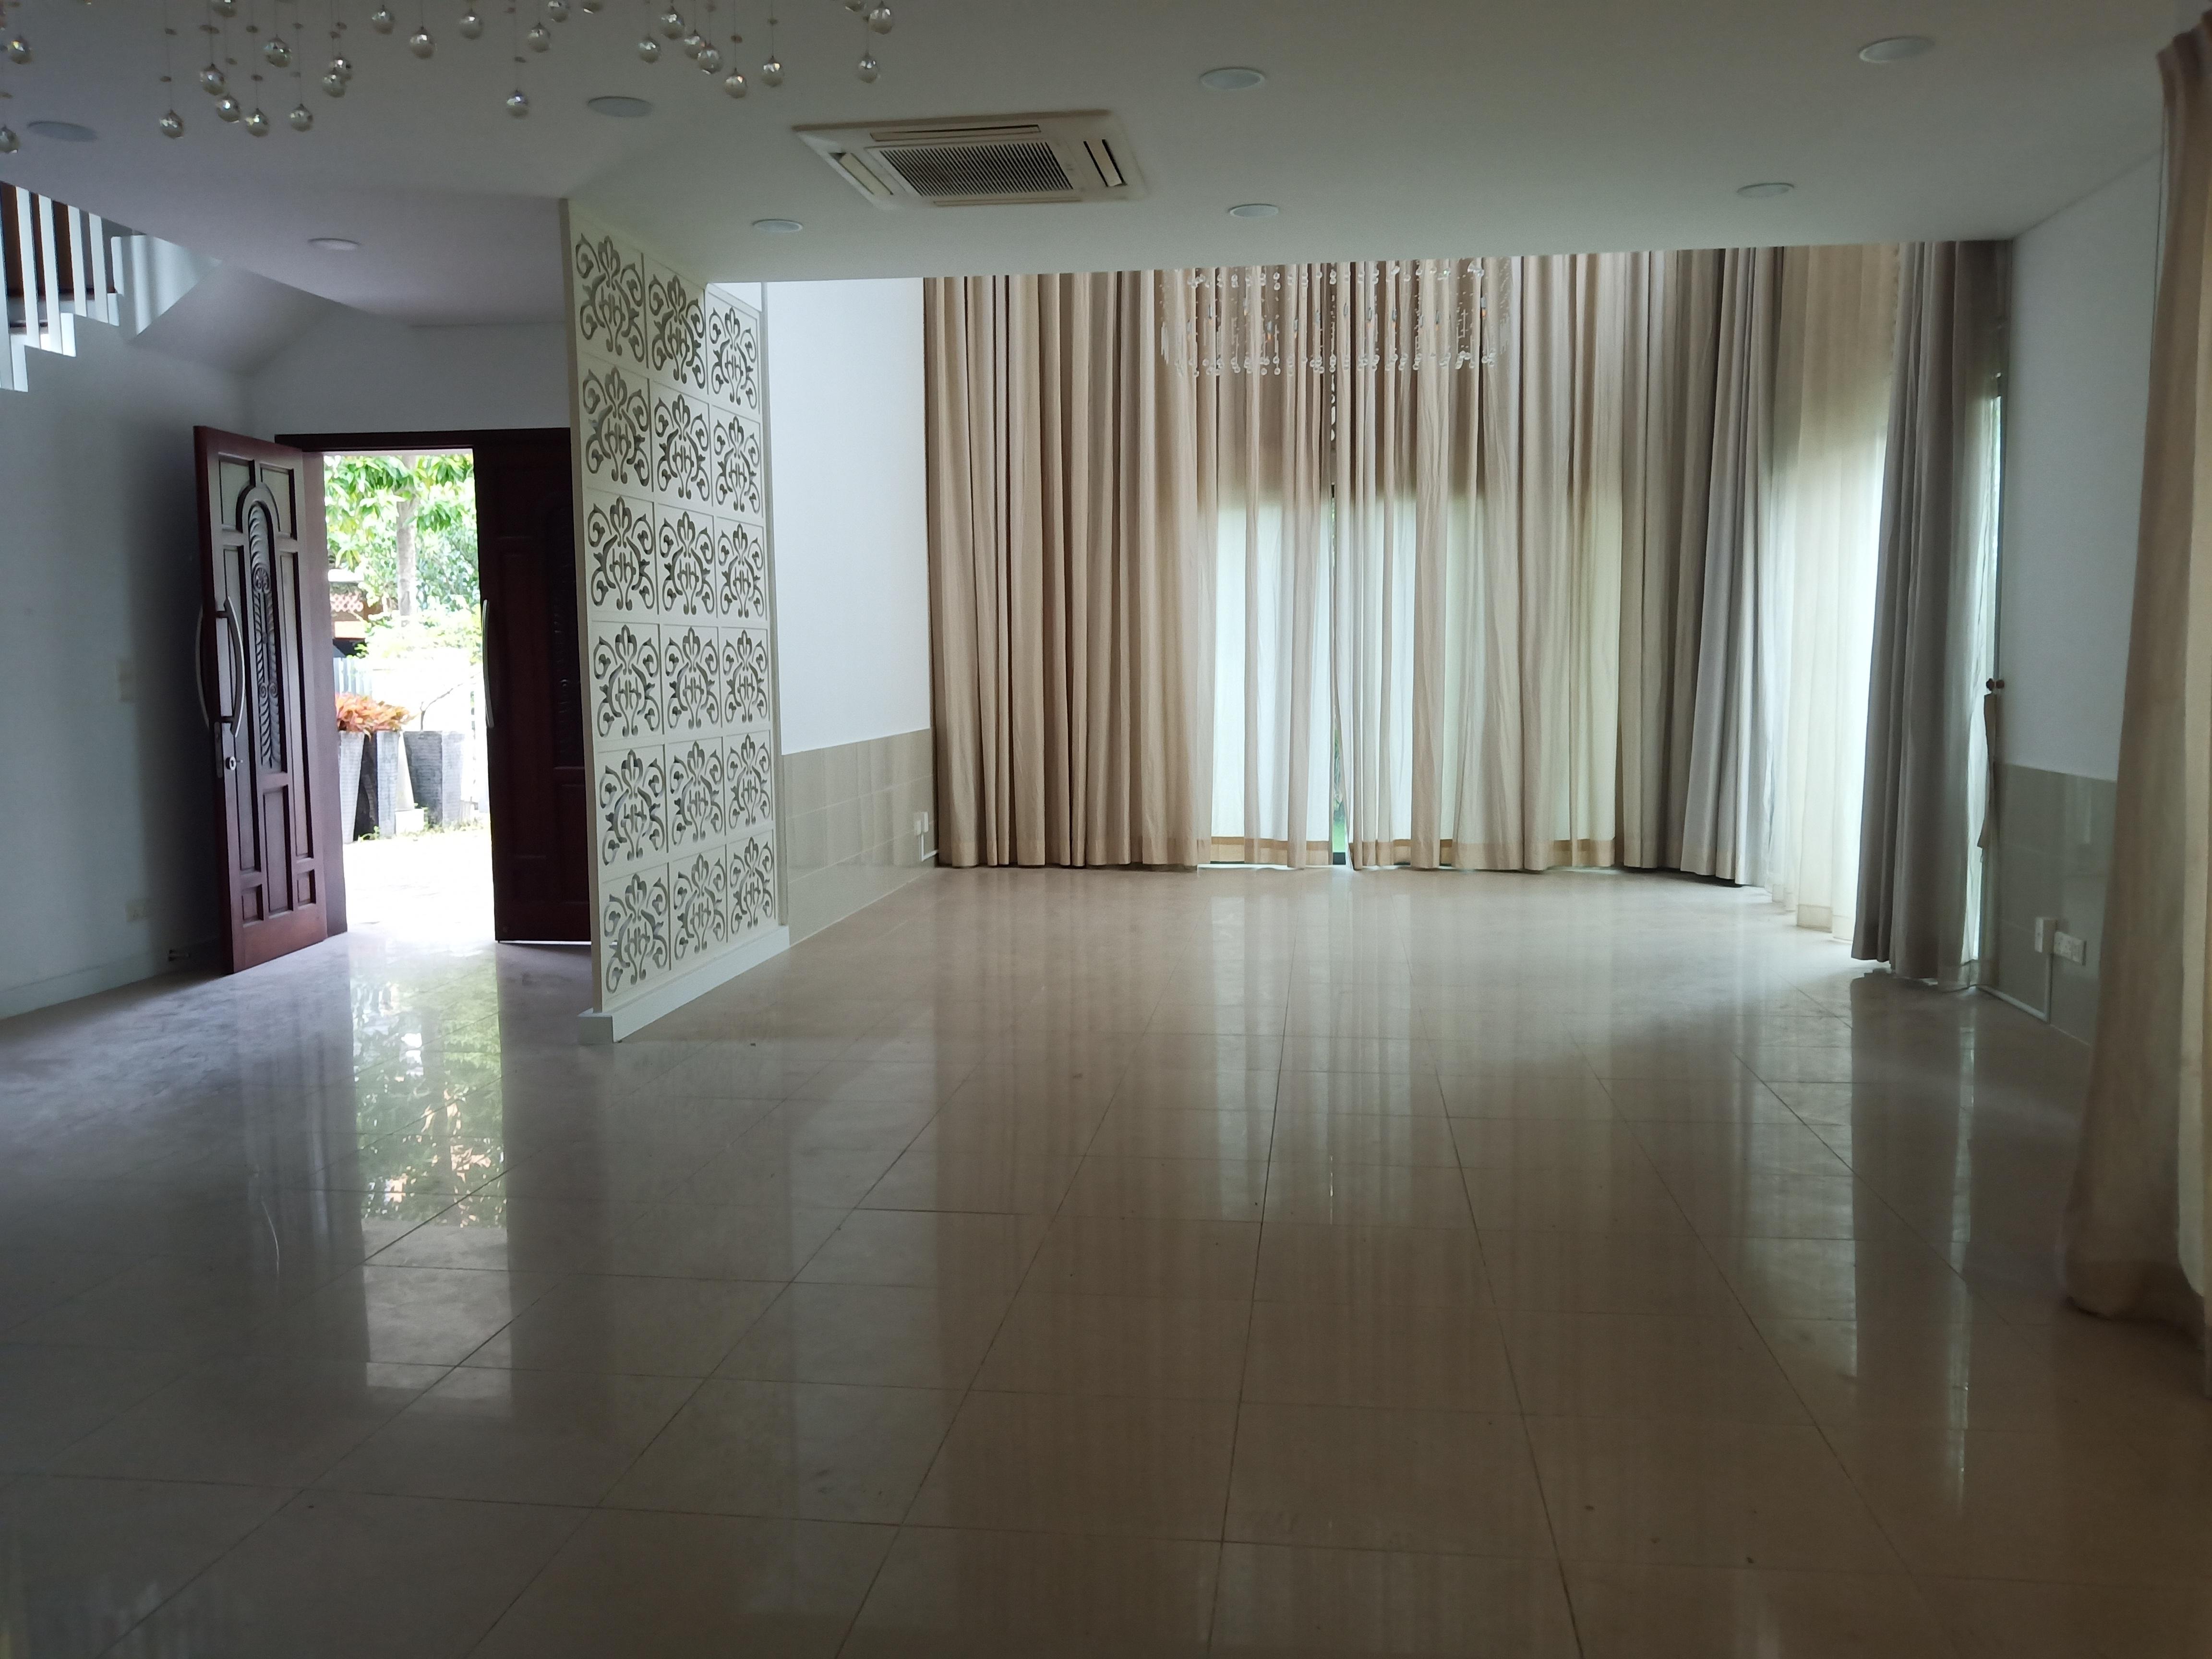 http://www.homeconnectvietnam.com/wp-content/uploads/2019/08/IMG_20190816_091646.jpg